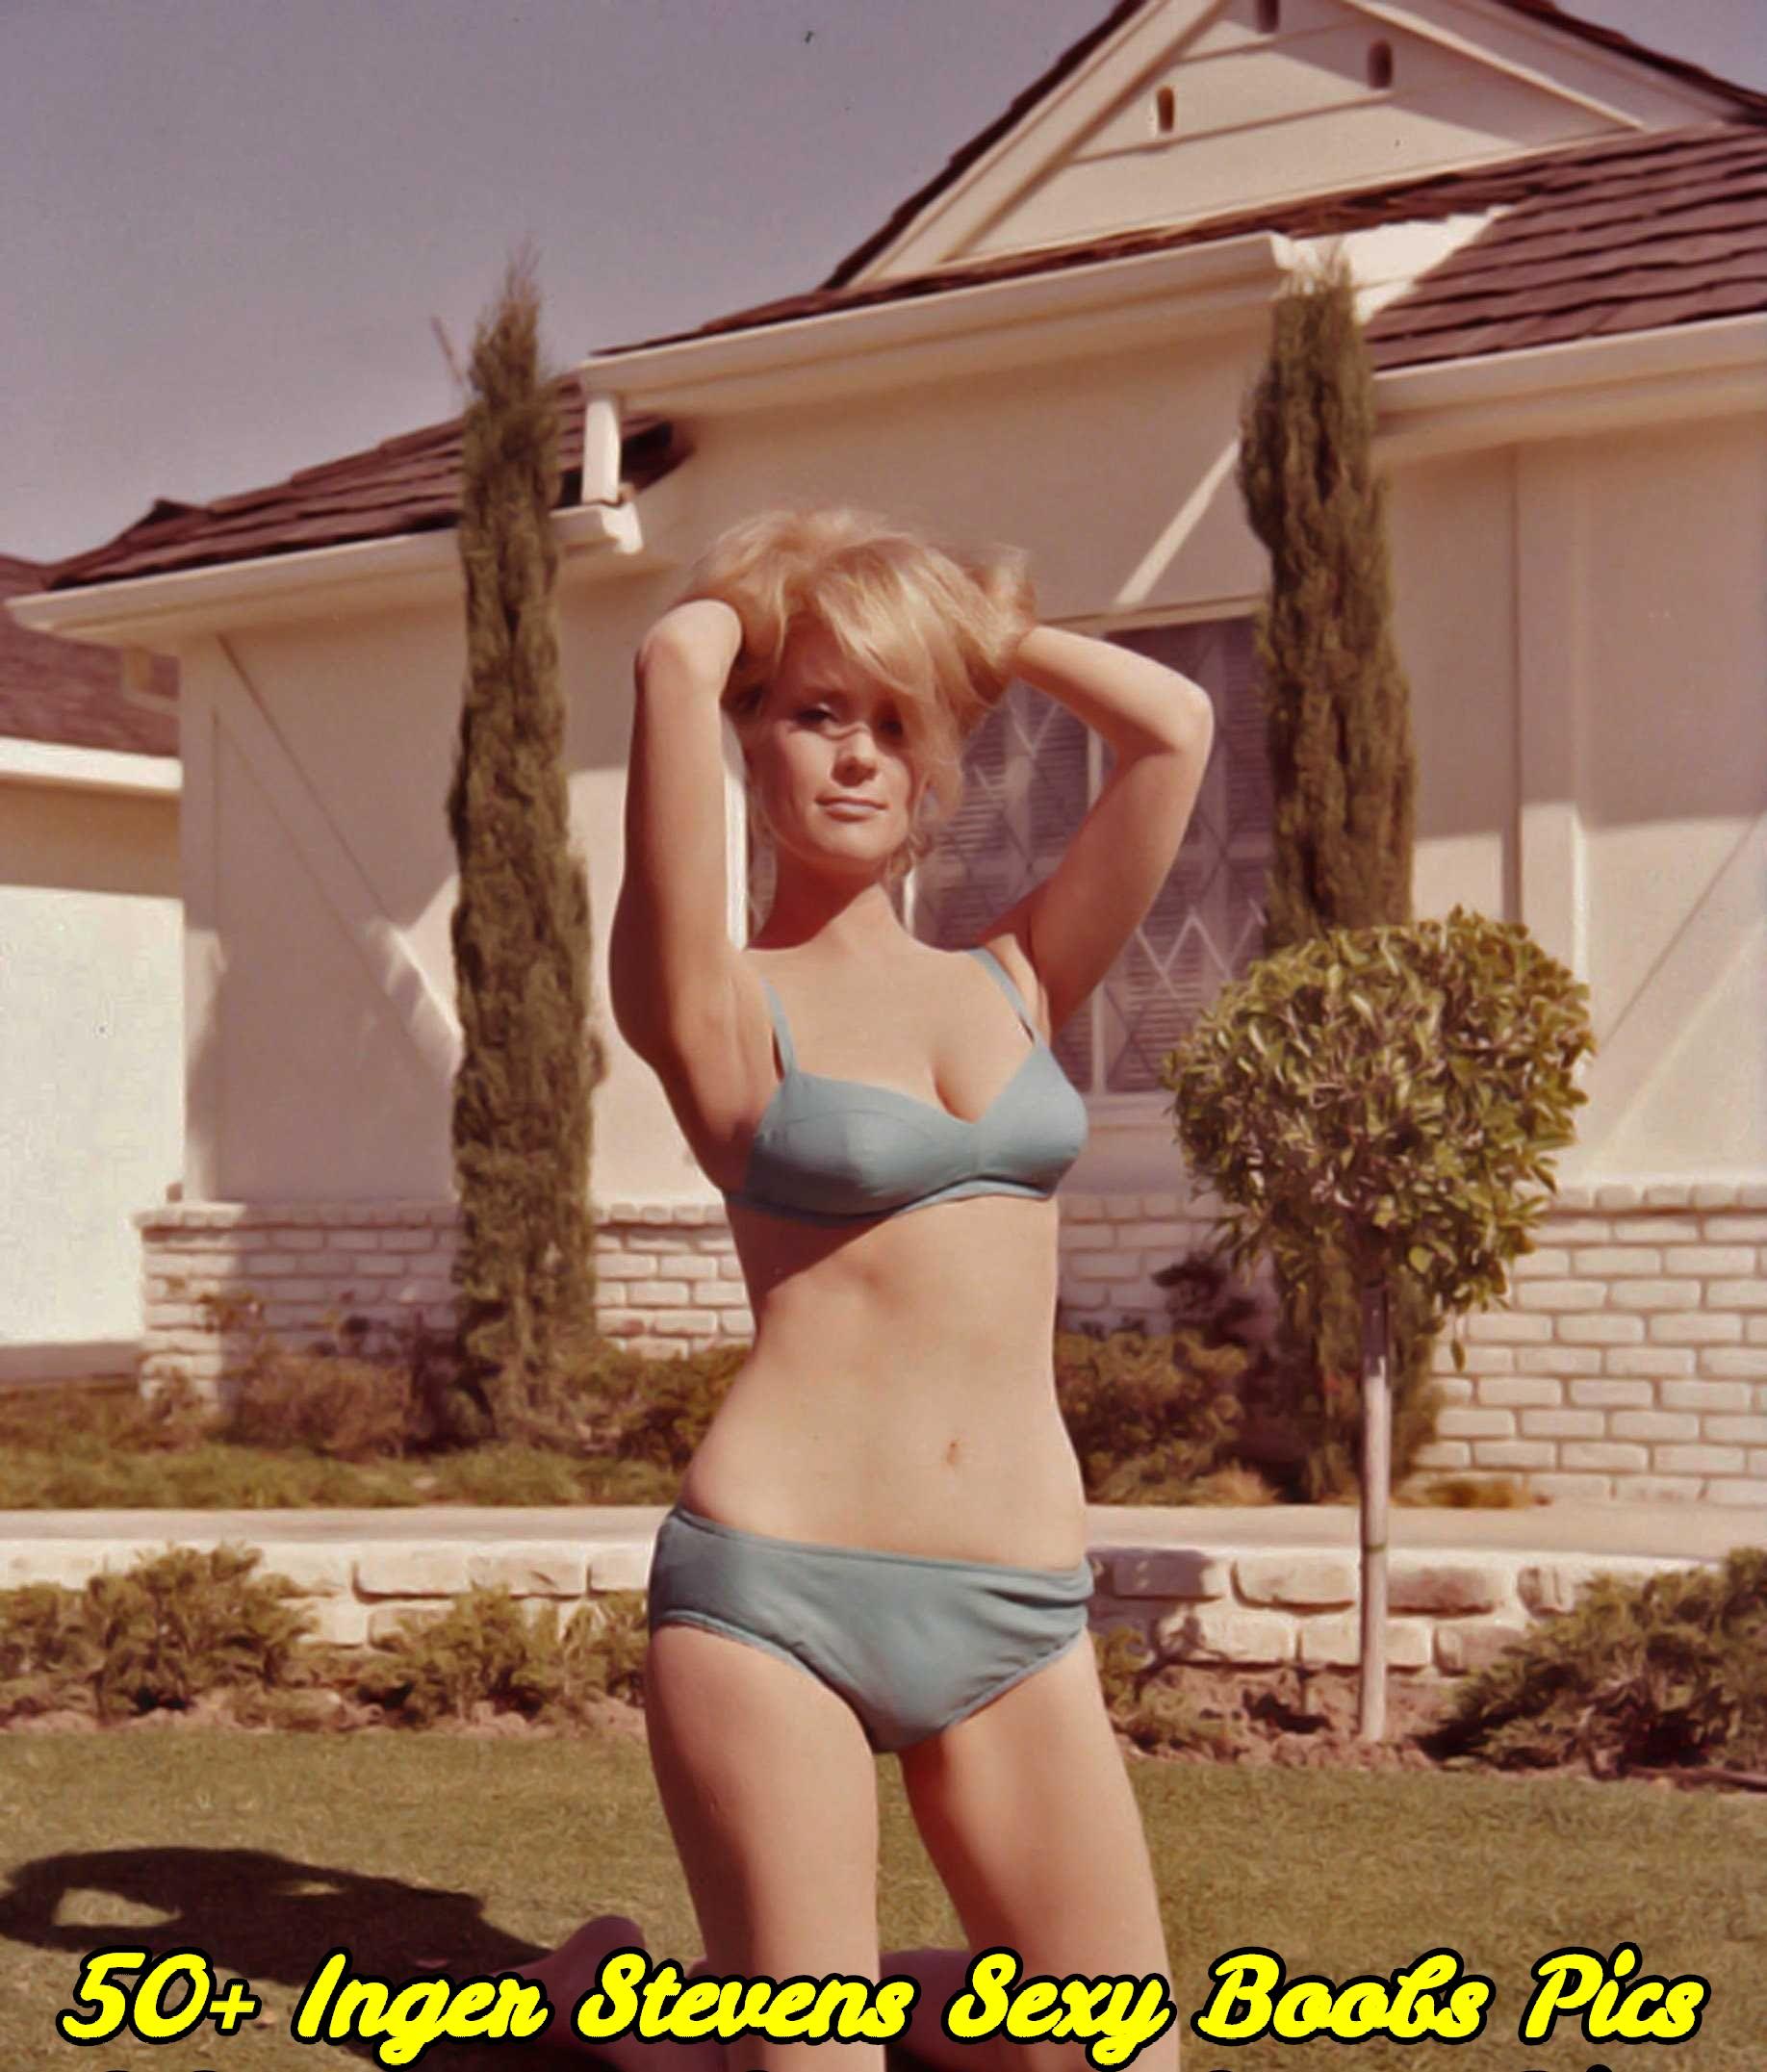 Inger Stevens sexy boobs pics